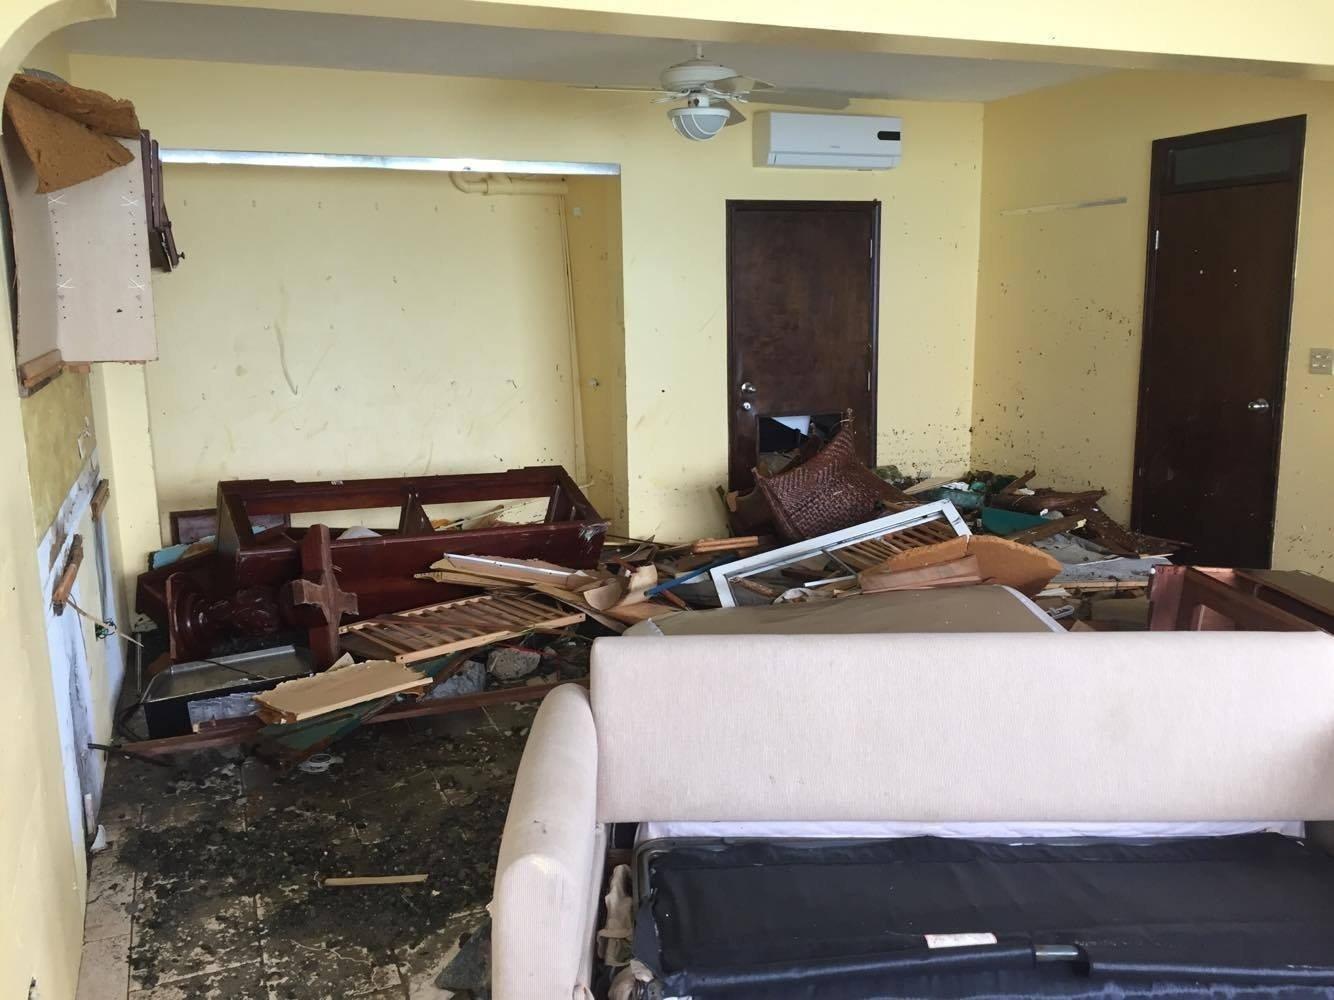 Andrew Burruss was staying in Apple Bay, British Virgin Islands when Hurricane Irma barrelled through.  Shot on: September 10, 2017